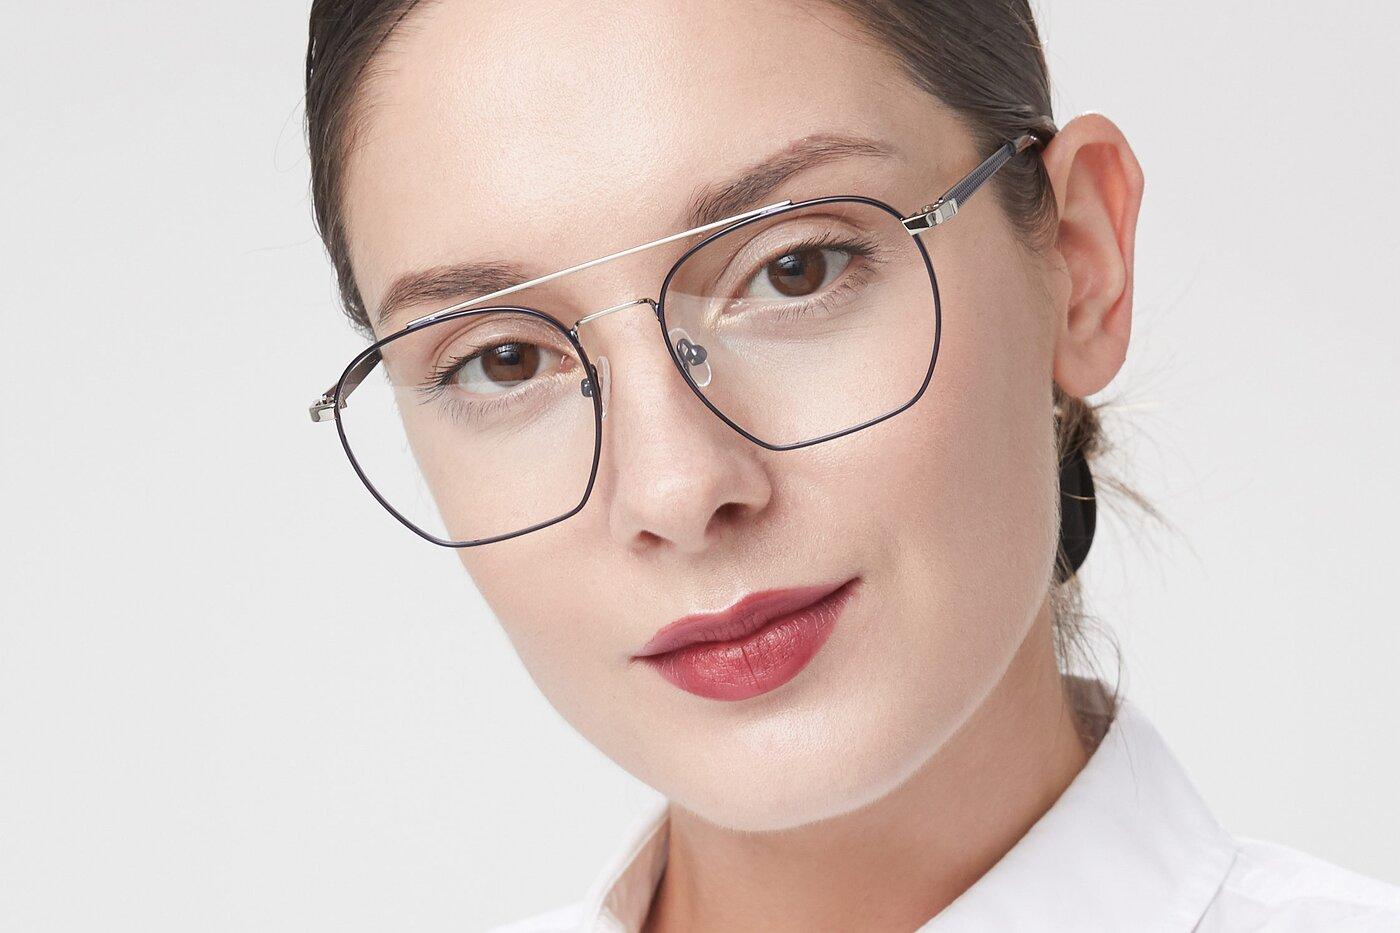 Blue-Silver Narrow Hipster Oversized Eyeglasses